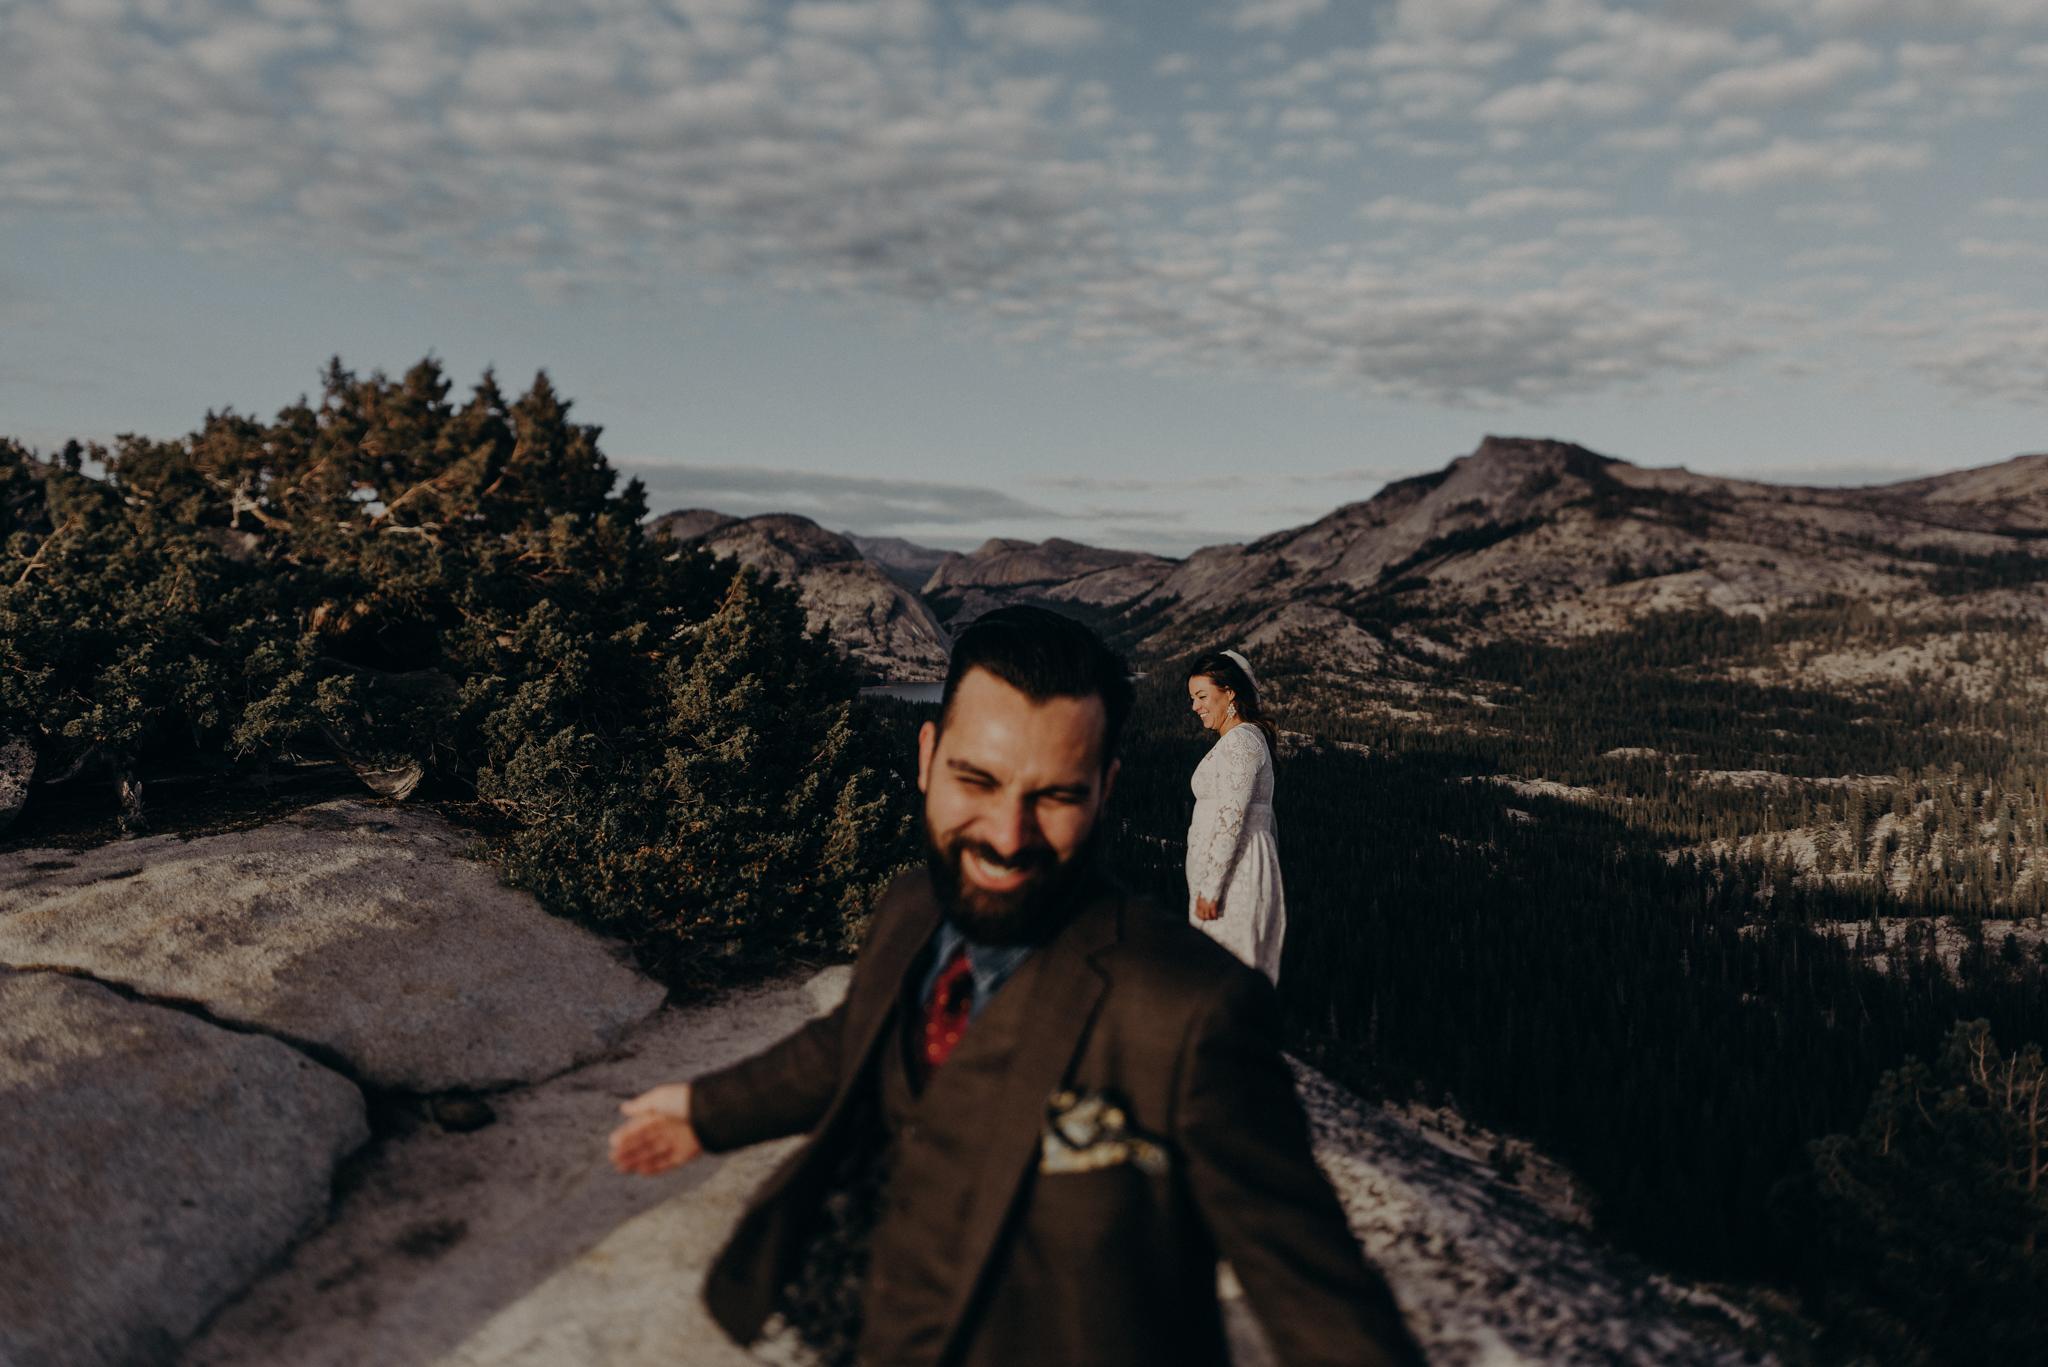 Yosemite Elopement Photographer - Evergreen Lodge Wedding Photographer - IsaiahAndTaylor.com-028.jpg